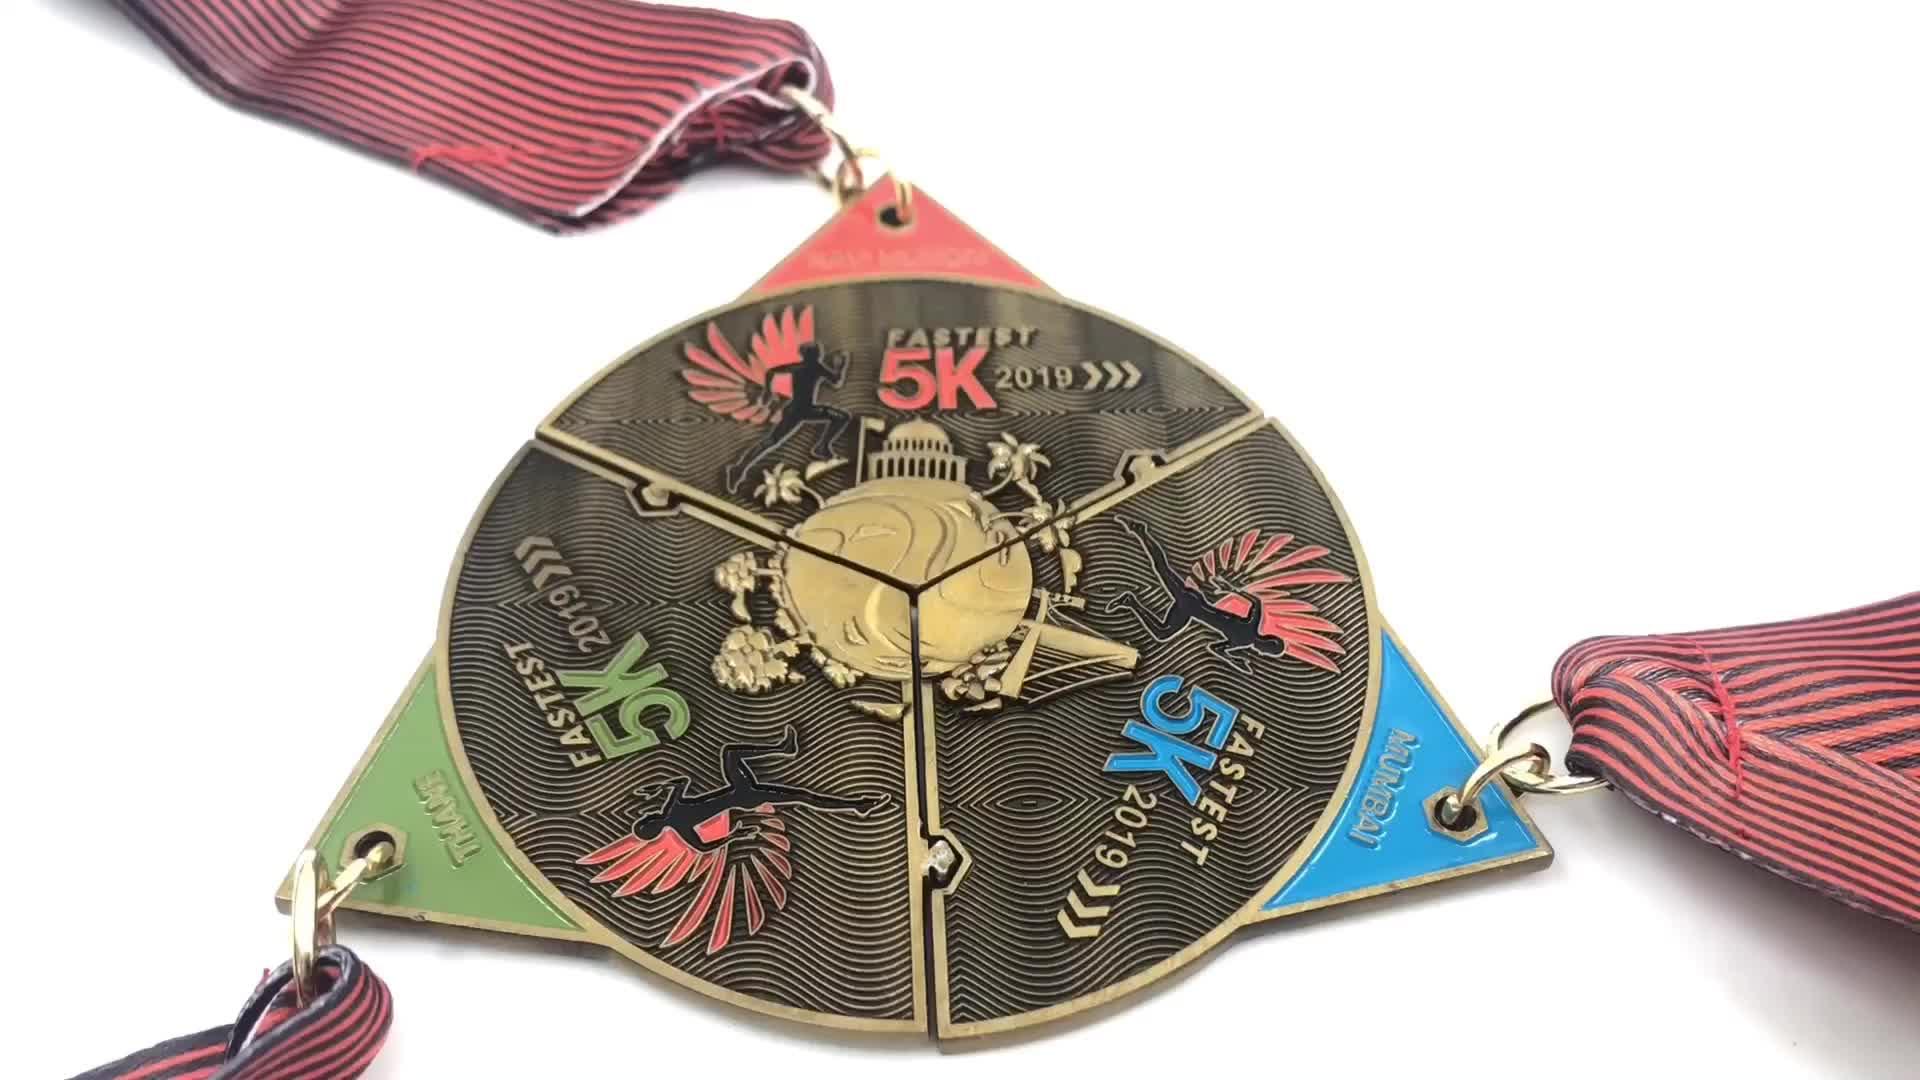 2020 novo prêmio personalizado barato atacado fundido metal medalha esportiva